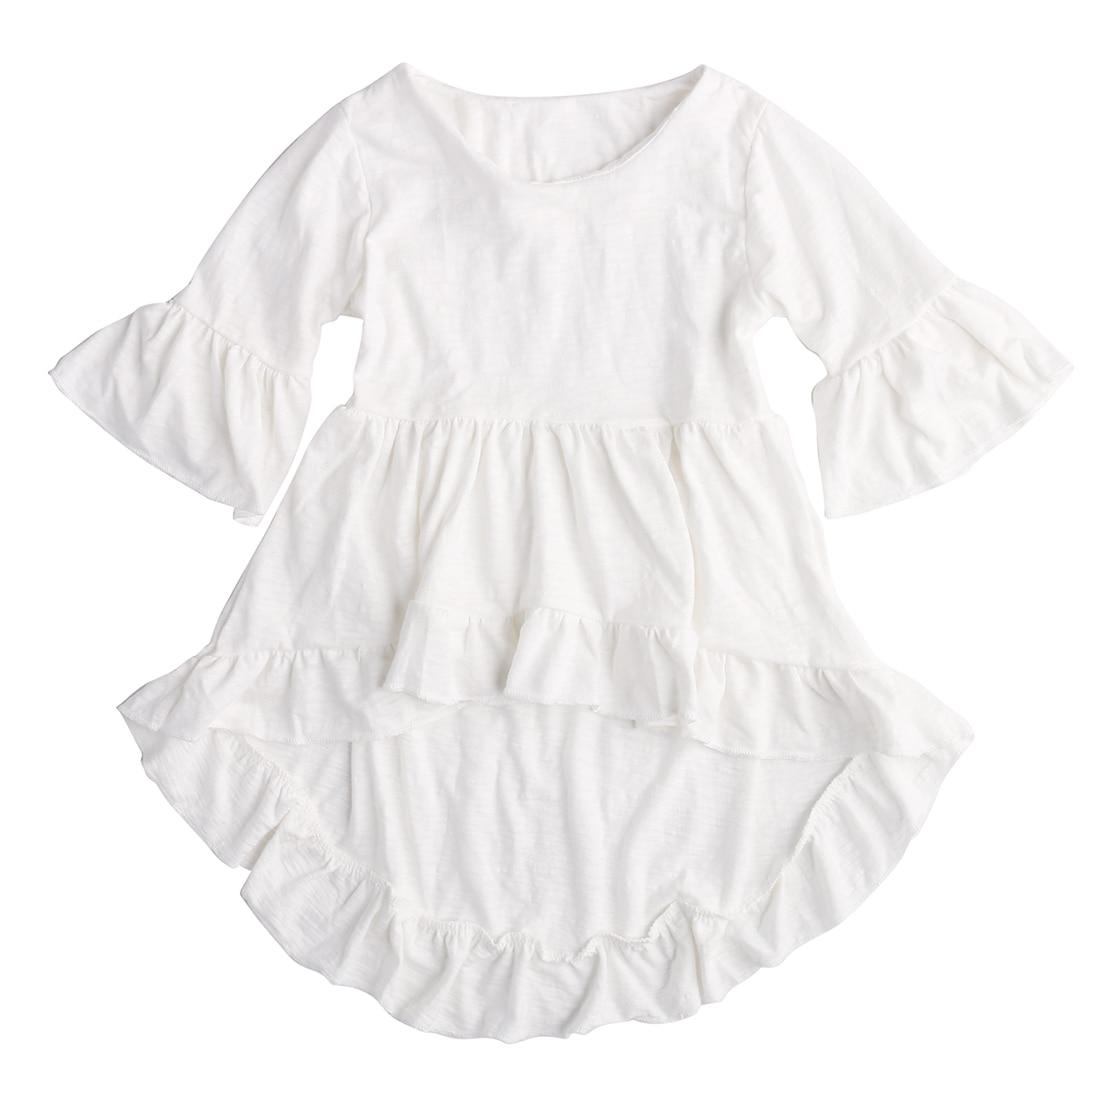 1 Stks Nieuwe Kids Baby Peuter Baby Meisjes Pretty Elegant Prinses Outfits Top Jurk Shirt Kleding 1-6 T